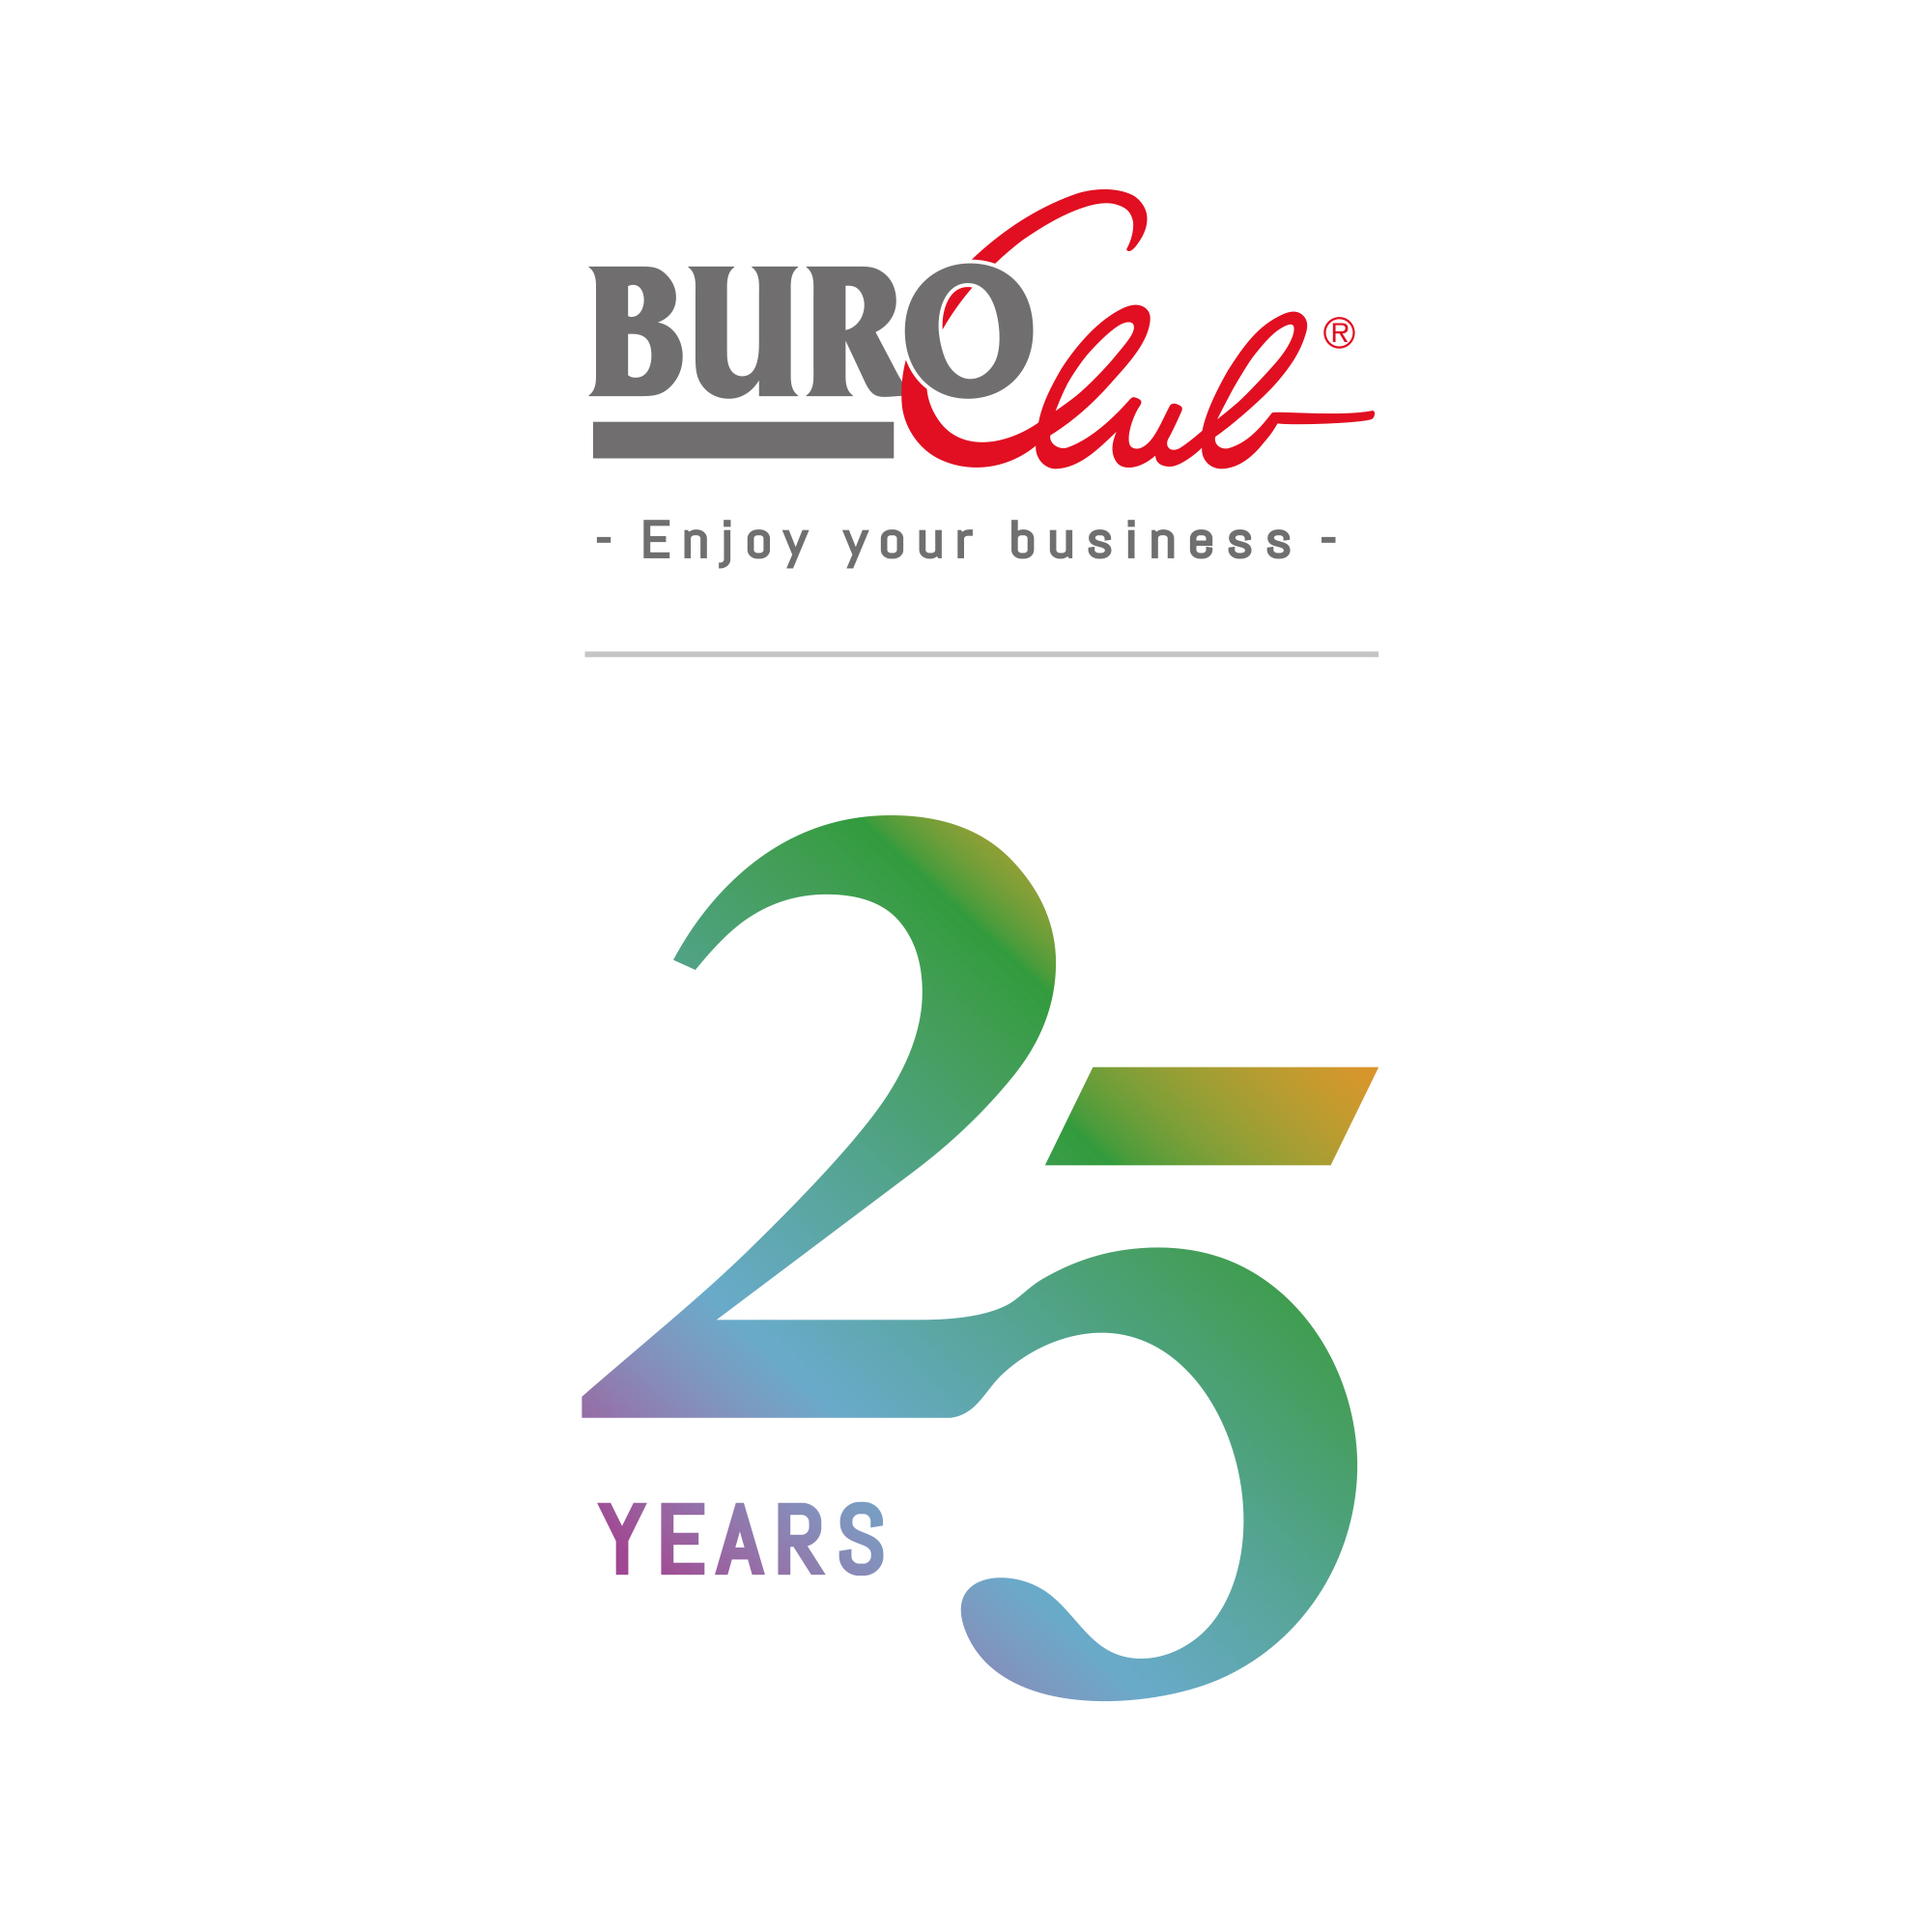 BURO Club Valence